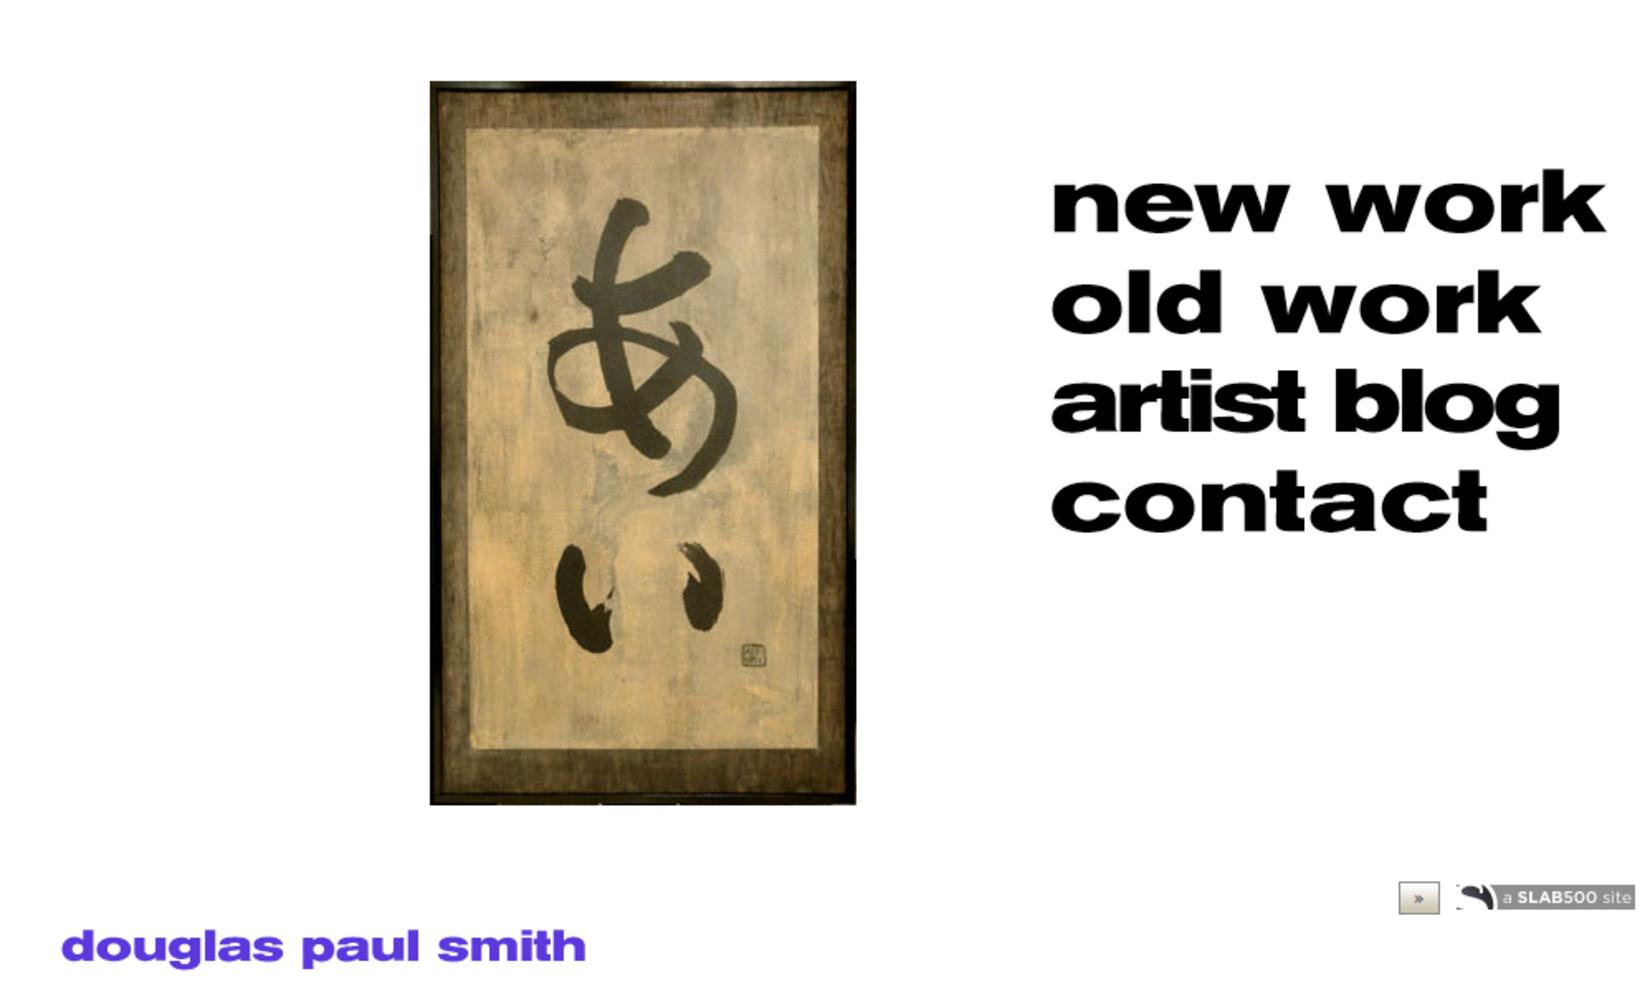 Douglas Paul Smith, Artist